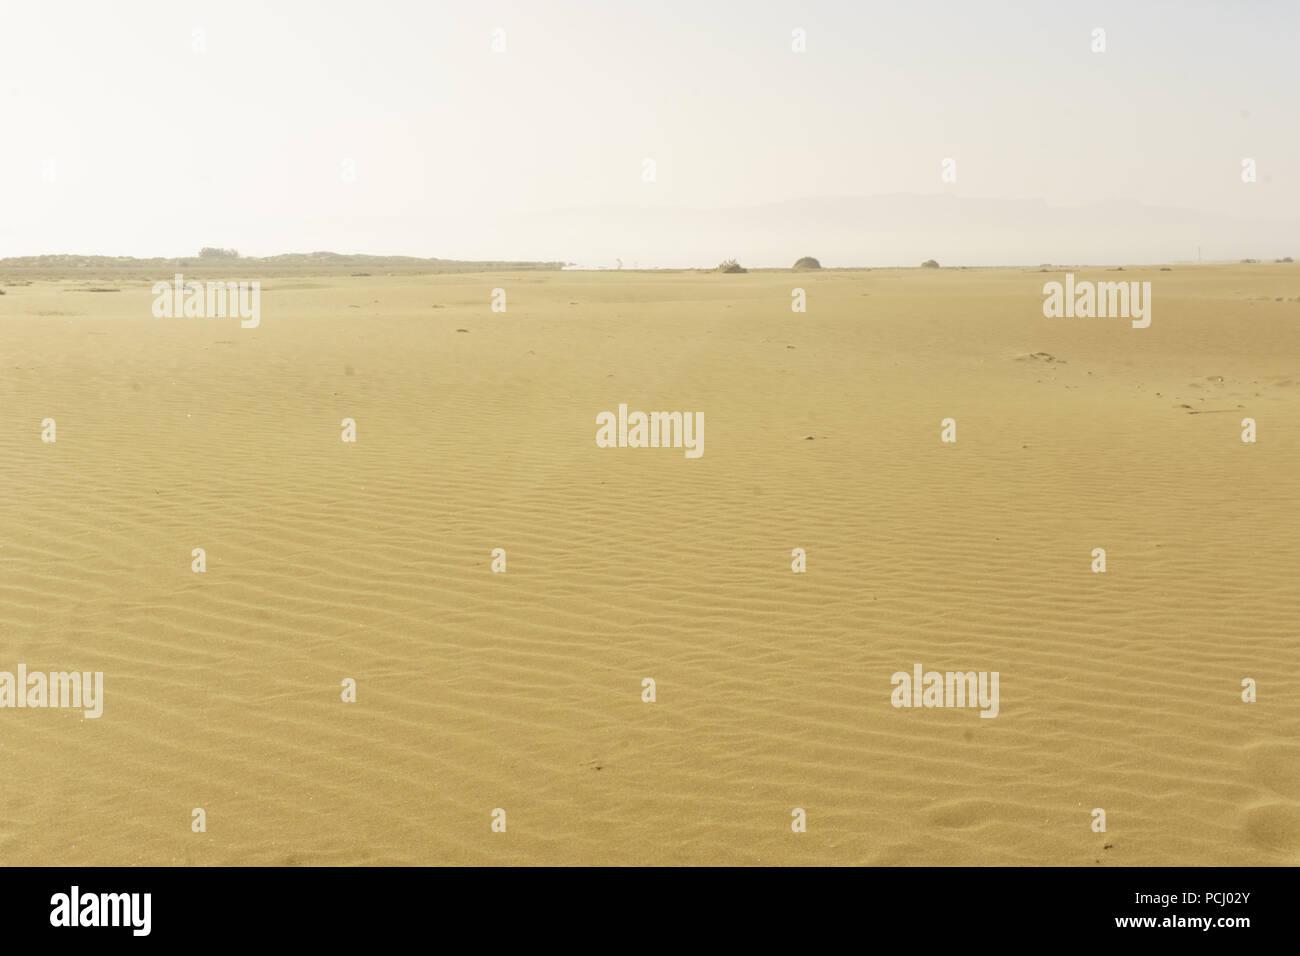 sandy desert before reaching the beach - Stock Image